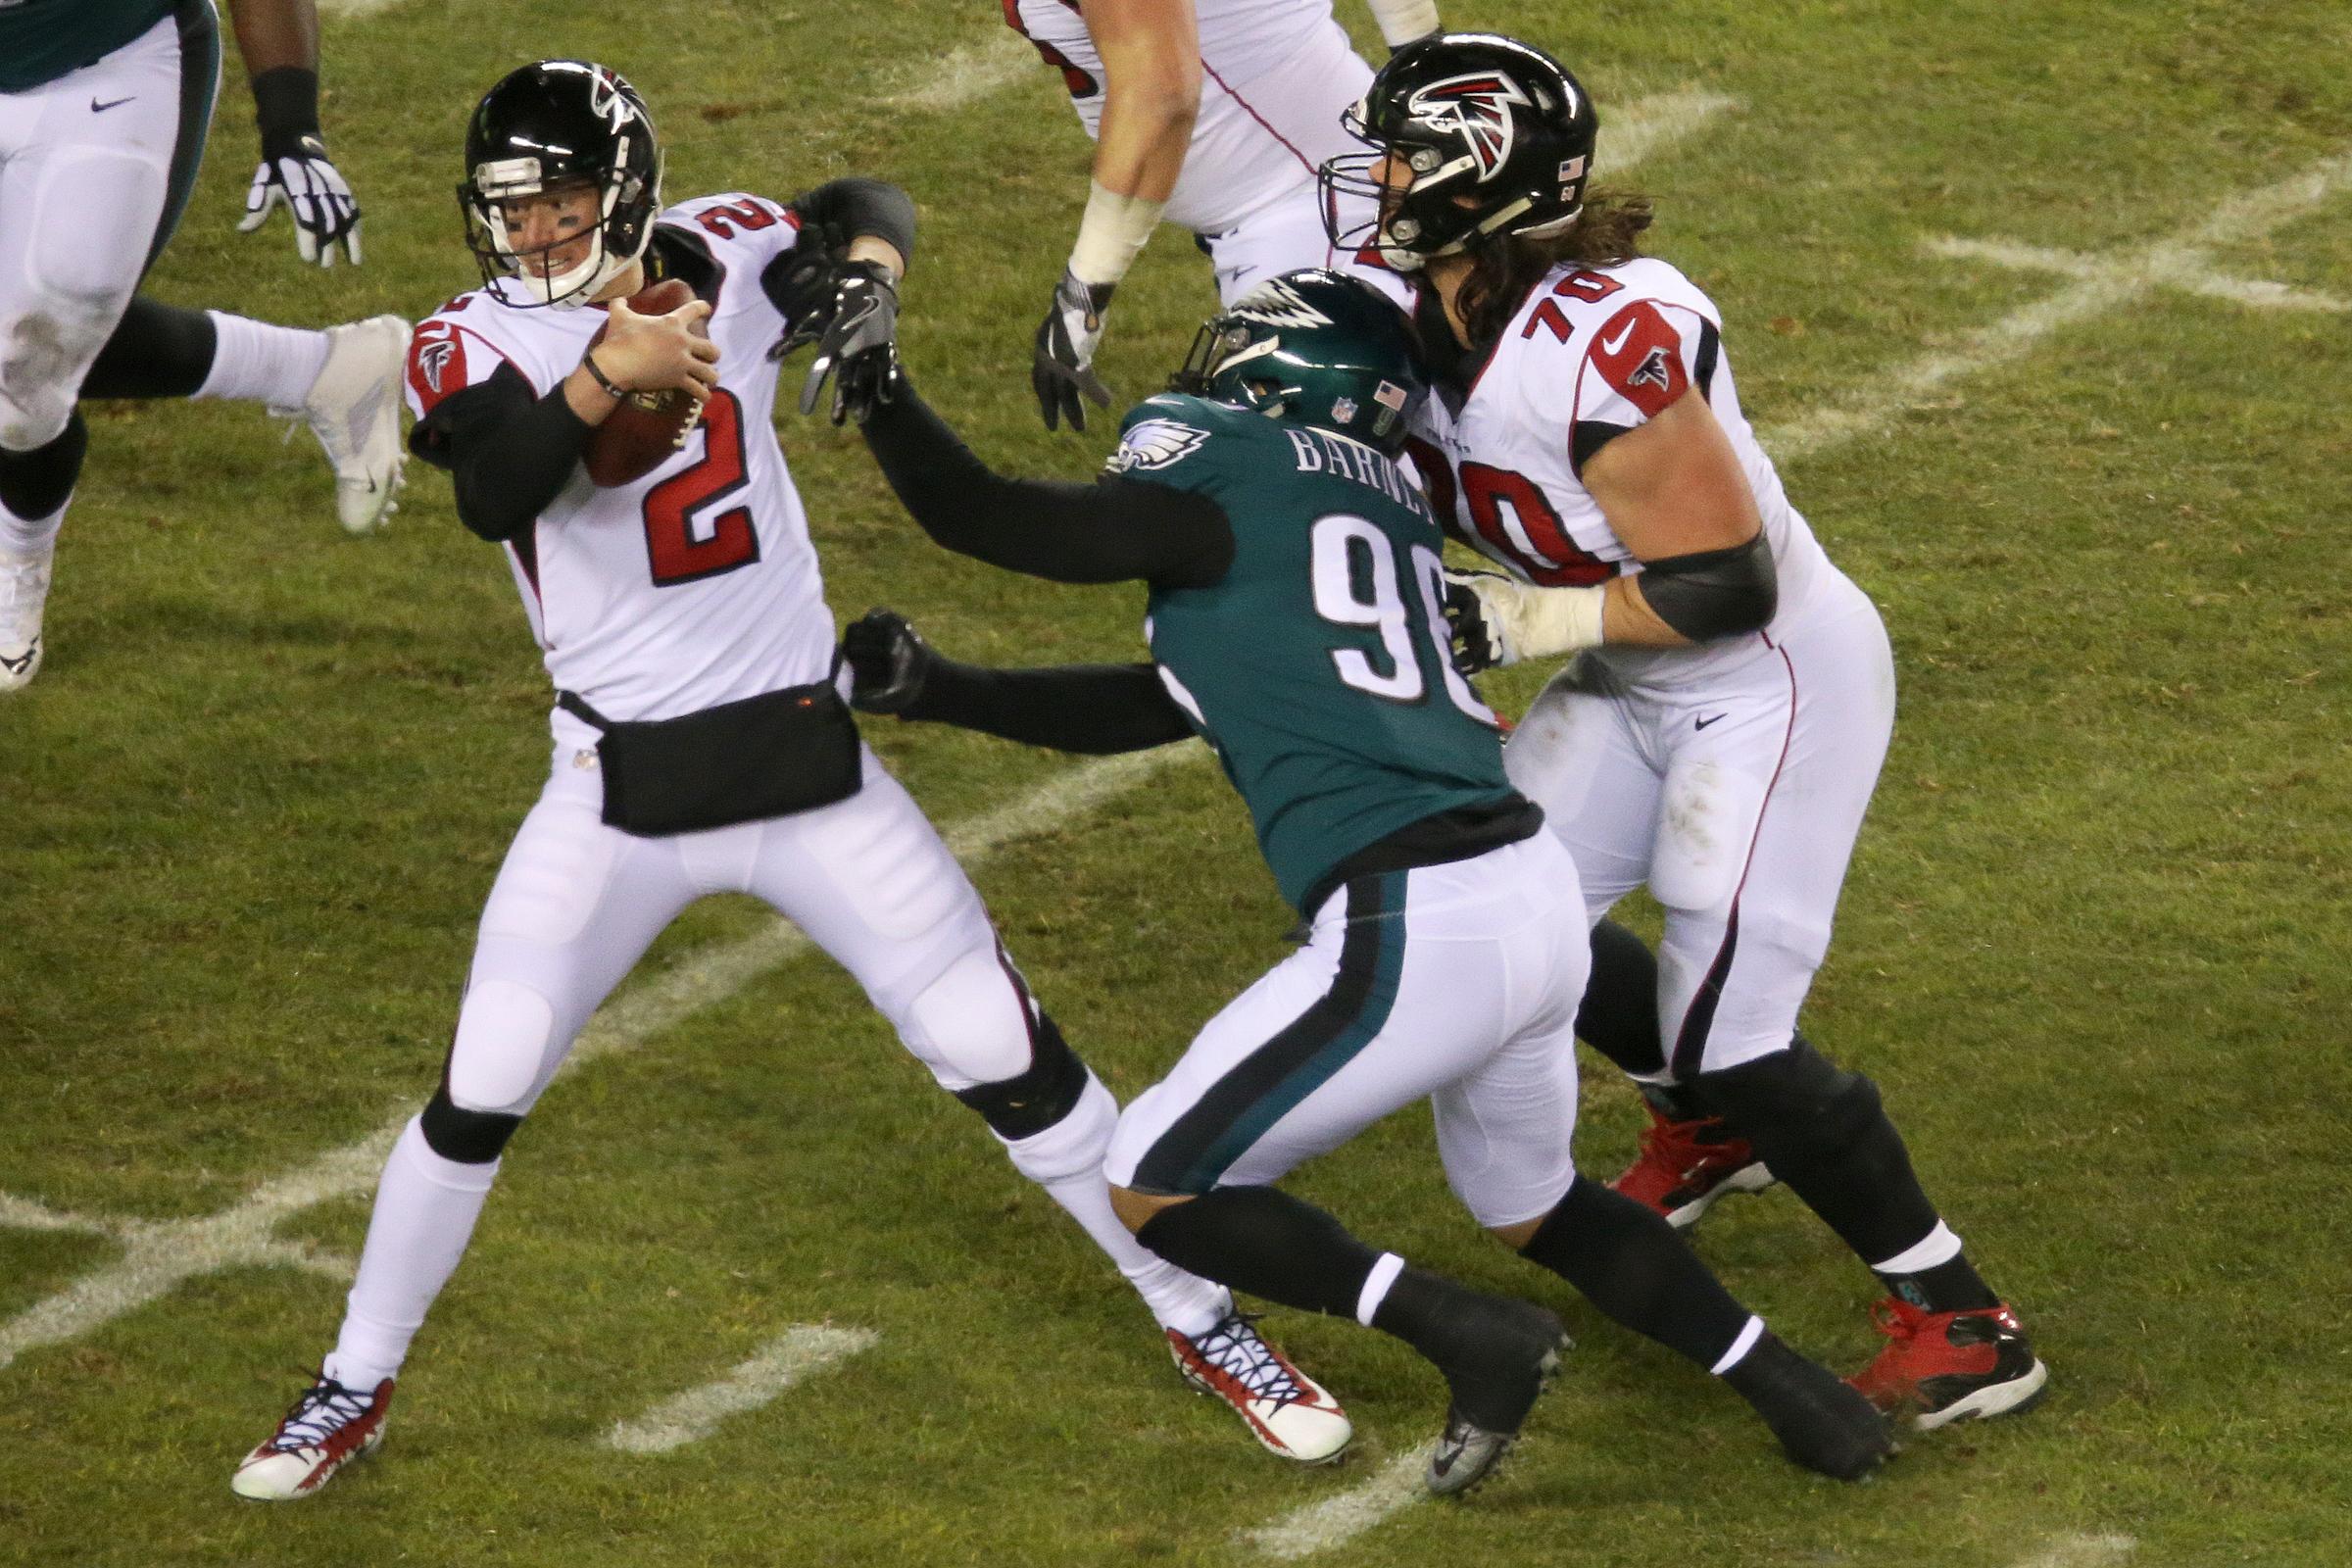 Falcons quarterback Matt Ryan (2) fending off a sack attempt by Eagles defensive end Derek Barnett (96) during the first half.